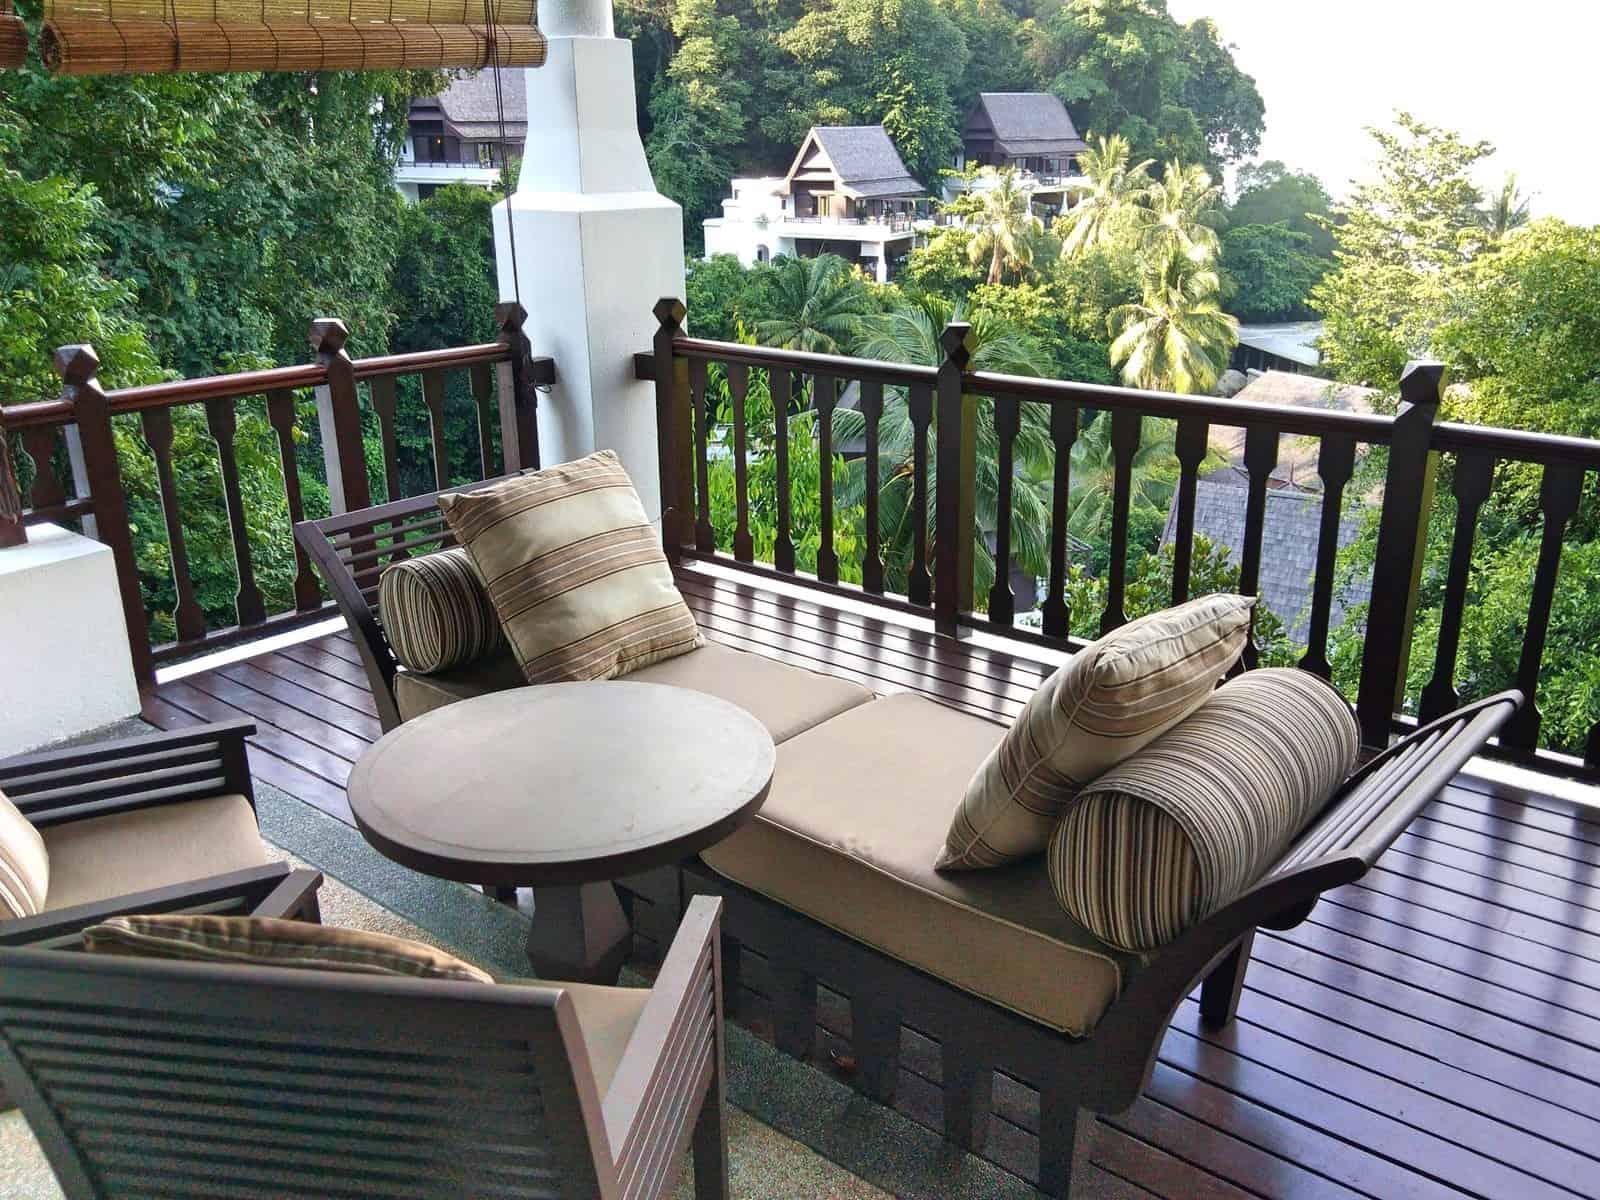 Pangkor-Laut-Resort-island-Malaysia-Travel-Mermaid-265